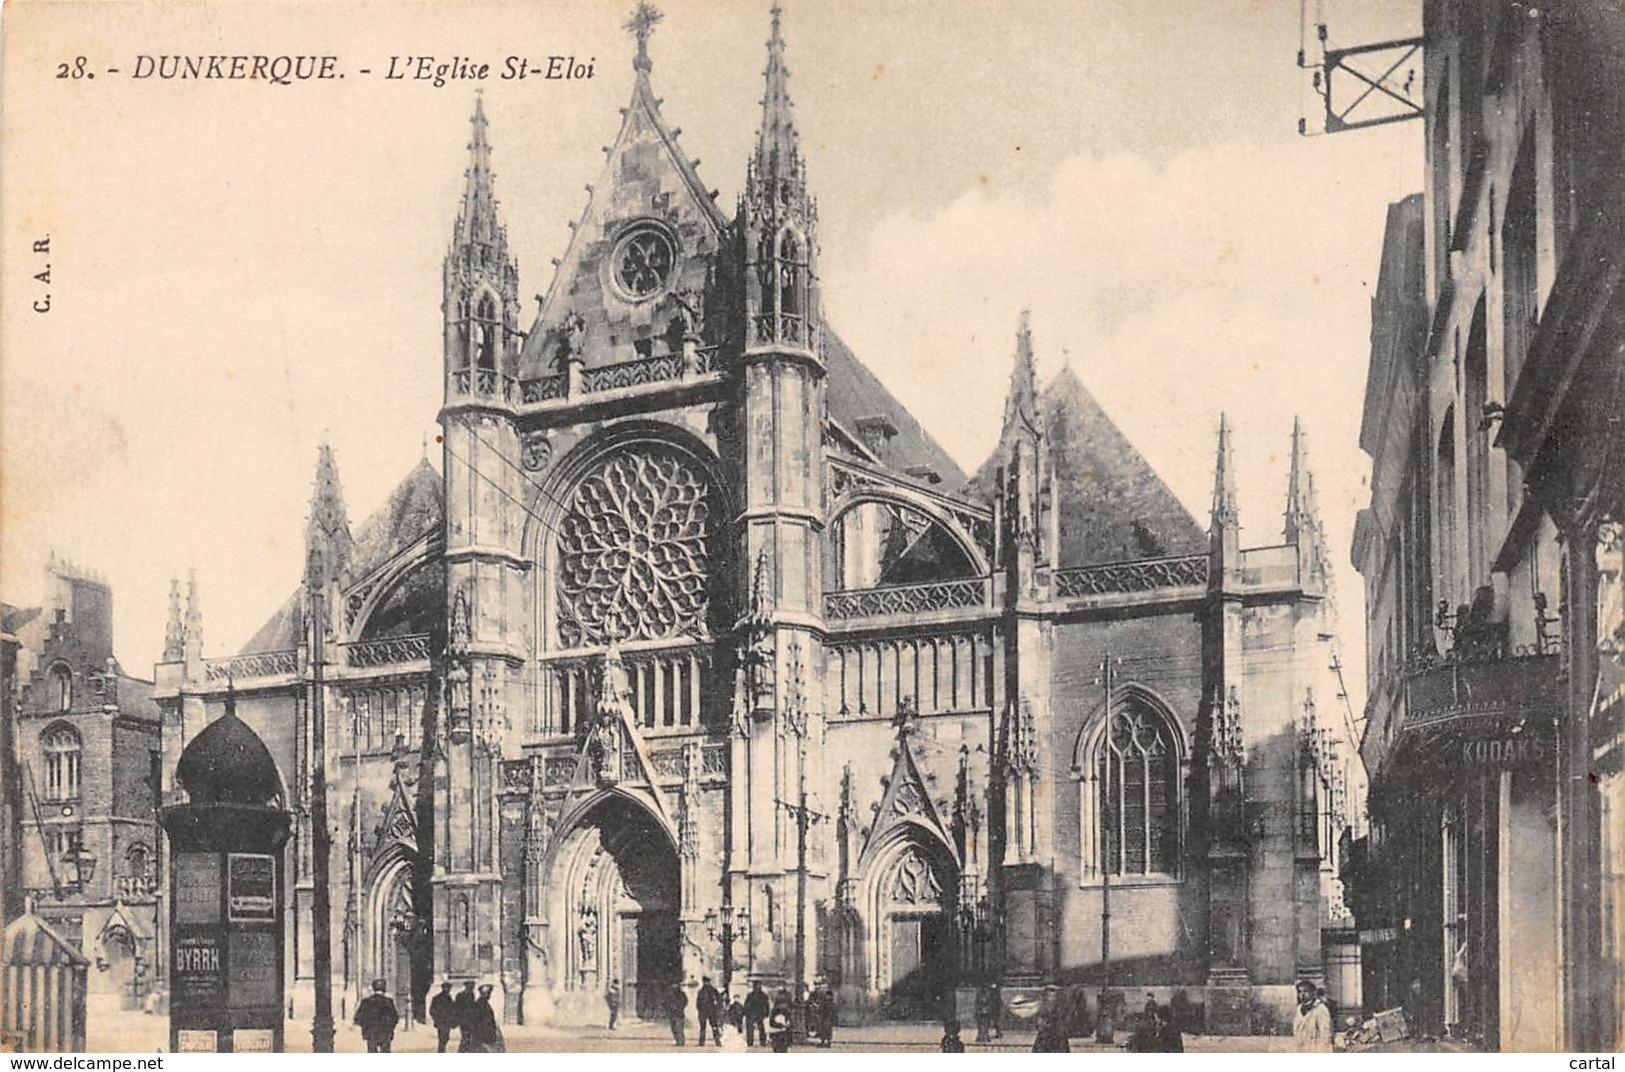 59 - DUNKERQUE - L'Eglise St-Eloi - Dunkerque